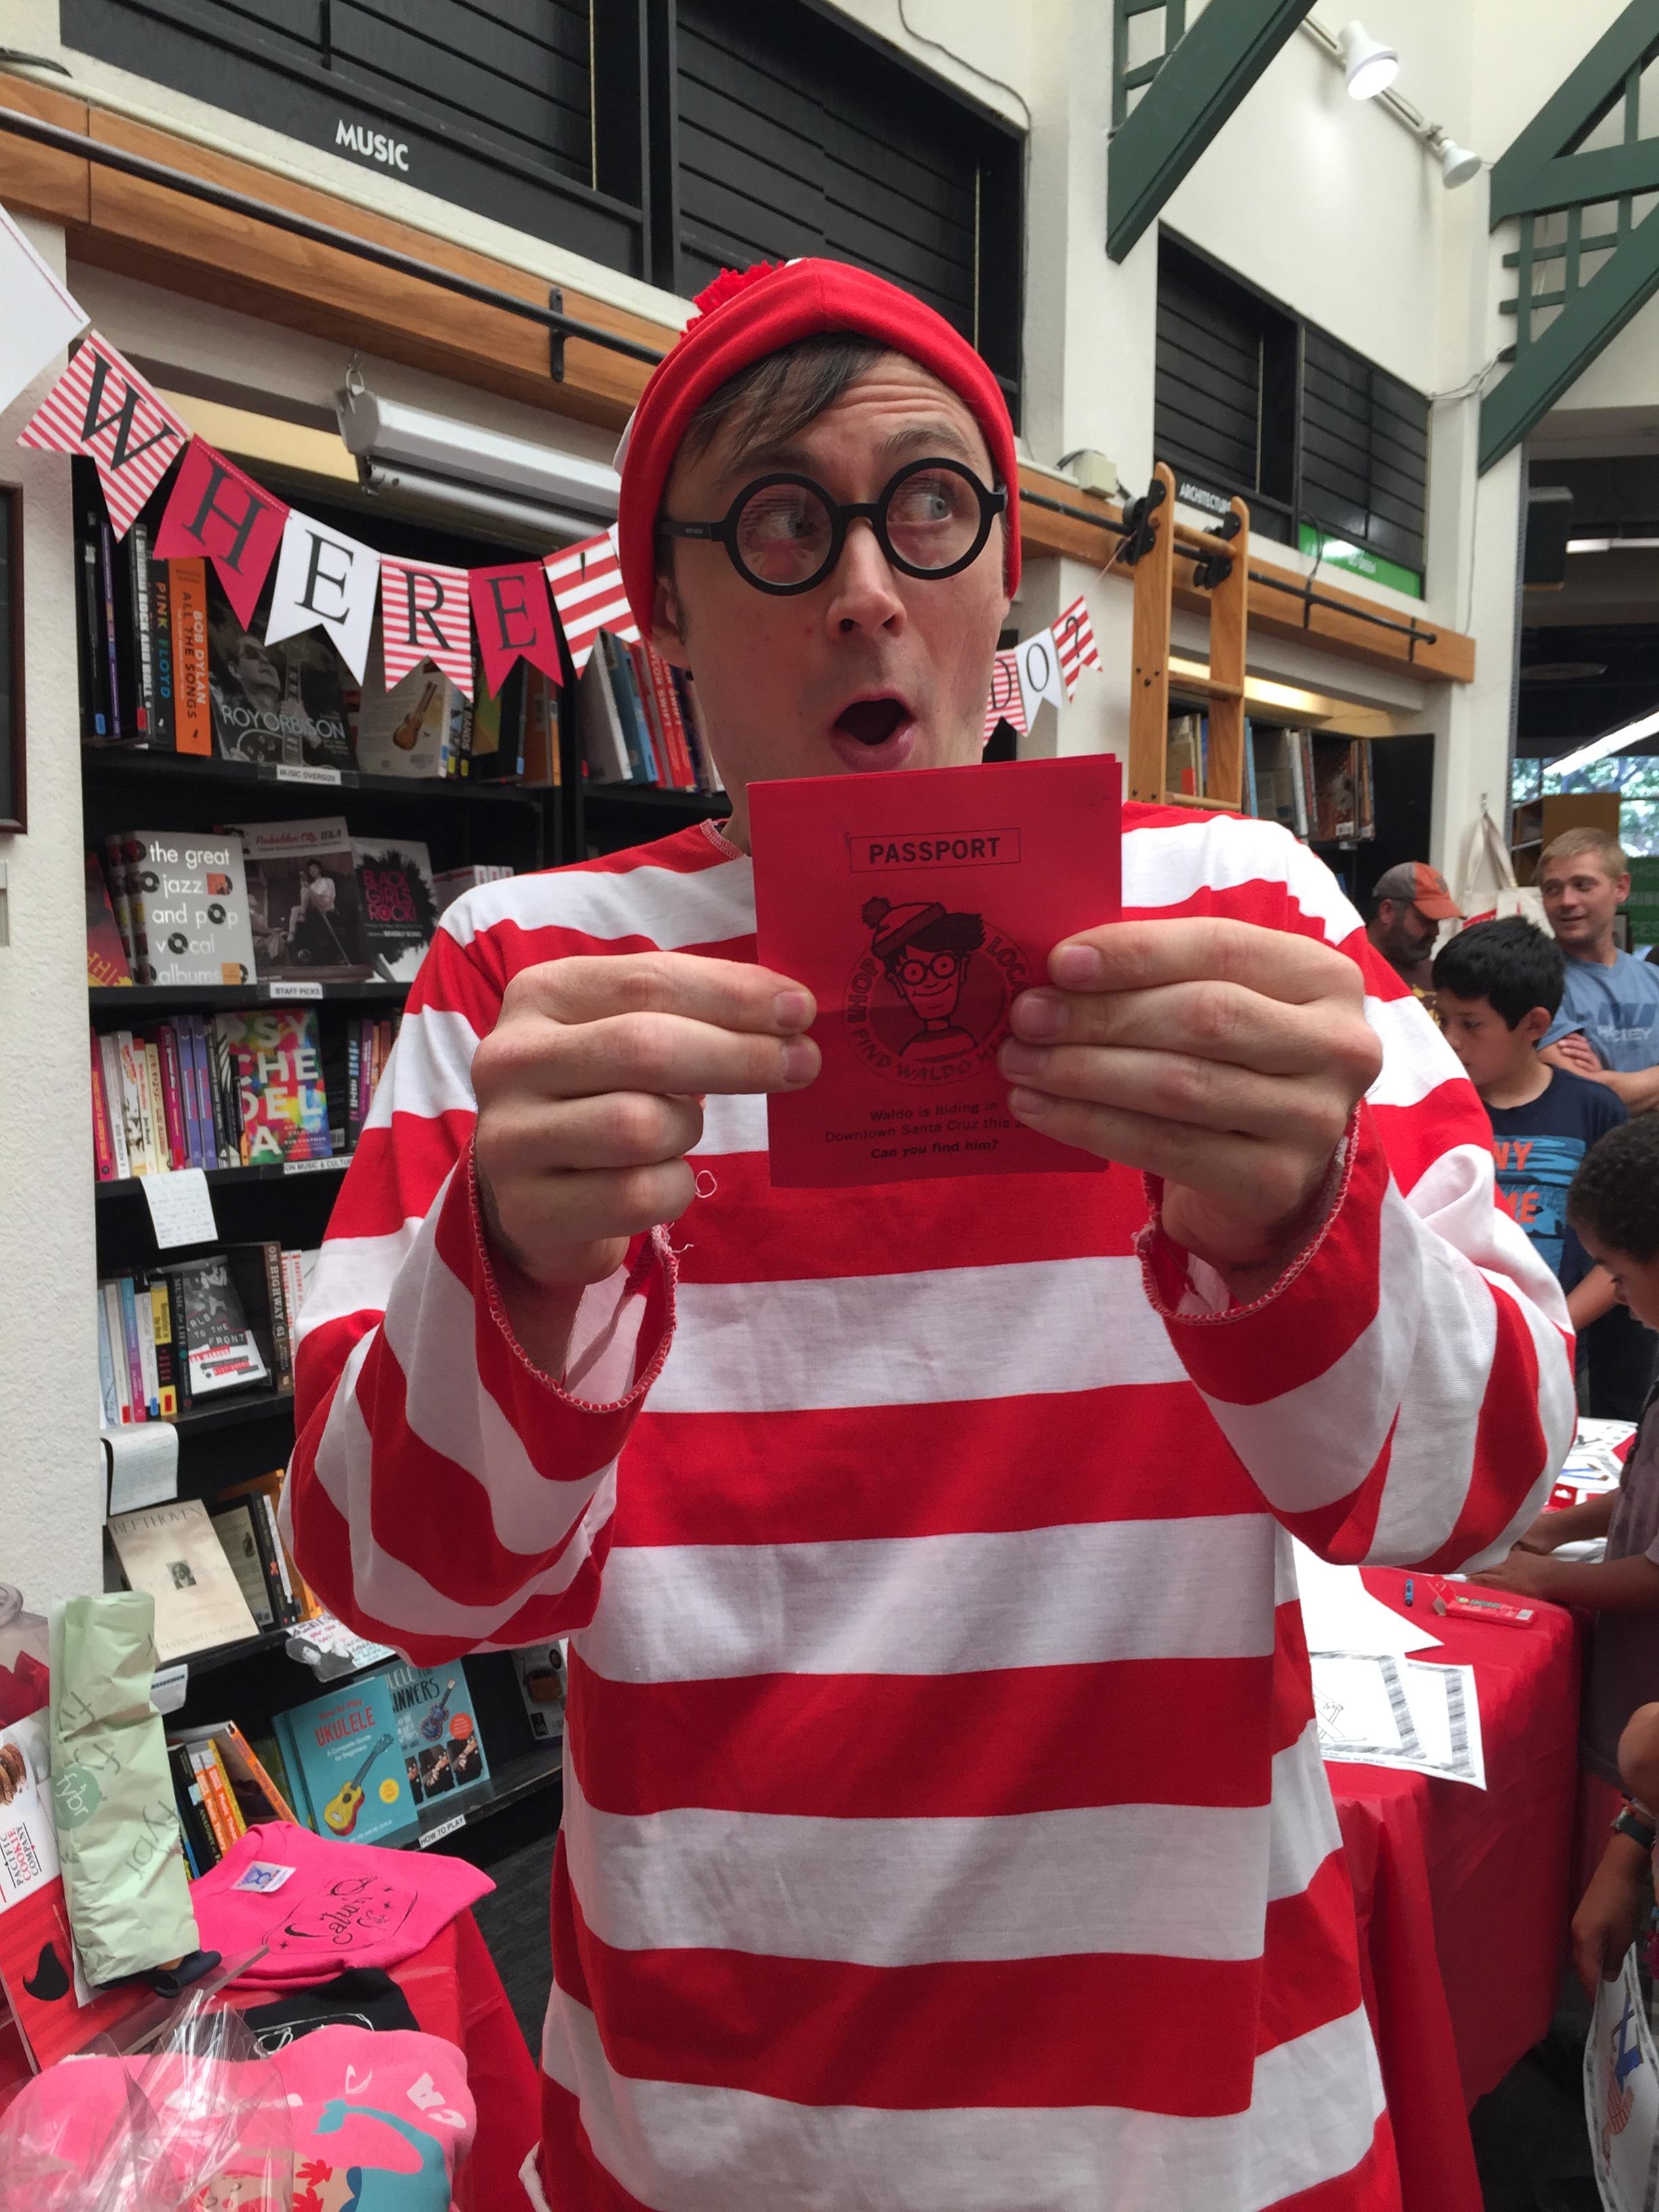 A staff member dressed as Waldo poses with a Find Waldo Local passport at Bookshop Santa Cruz.